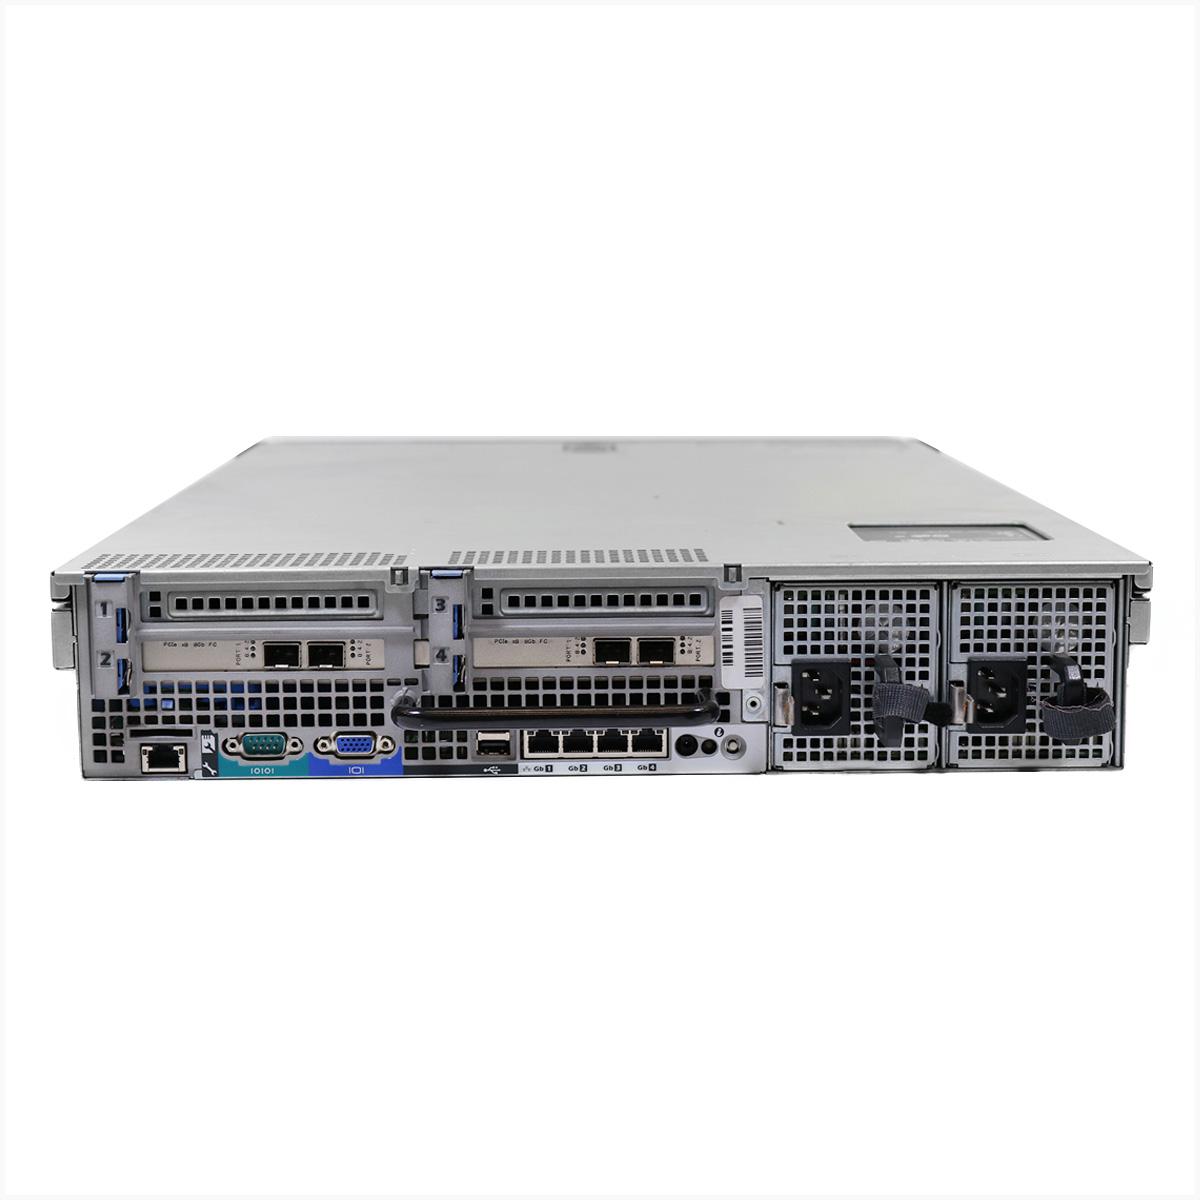 Servidor dell r710 2x xeon x5660 64gb 2x 1tb - usado